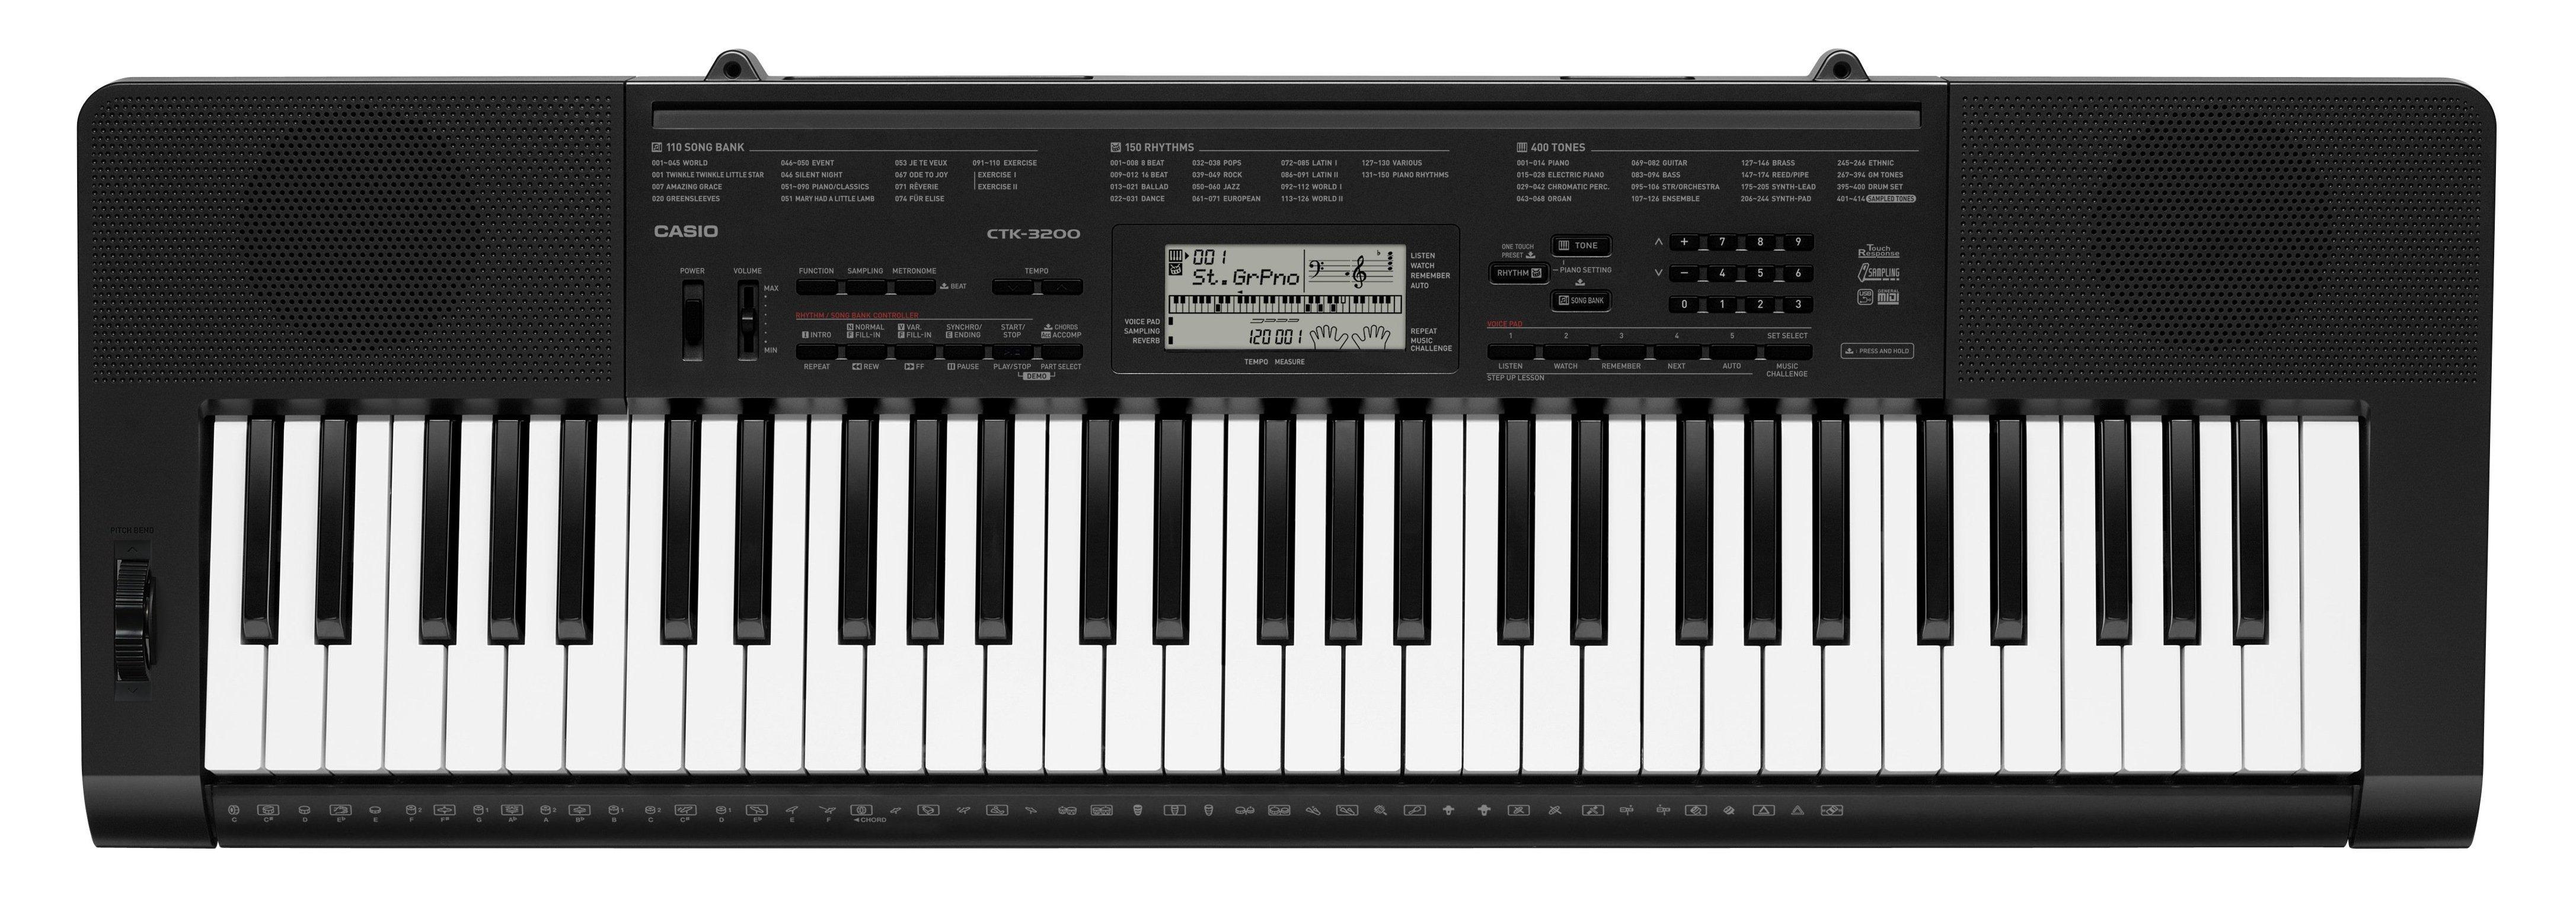 инструкция на синтезатор casio lk-200s